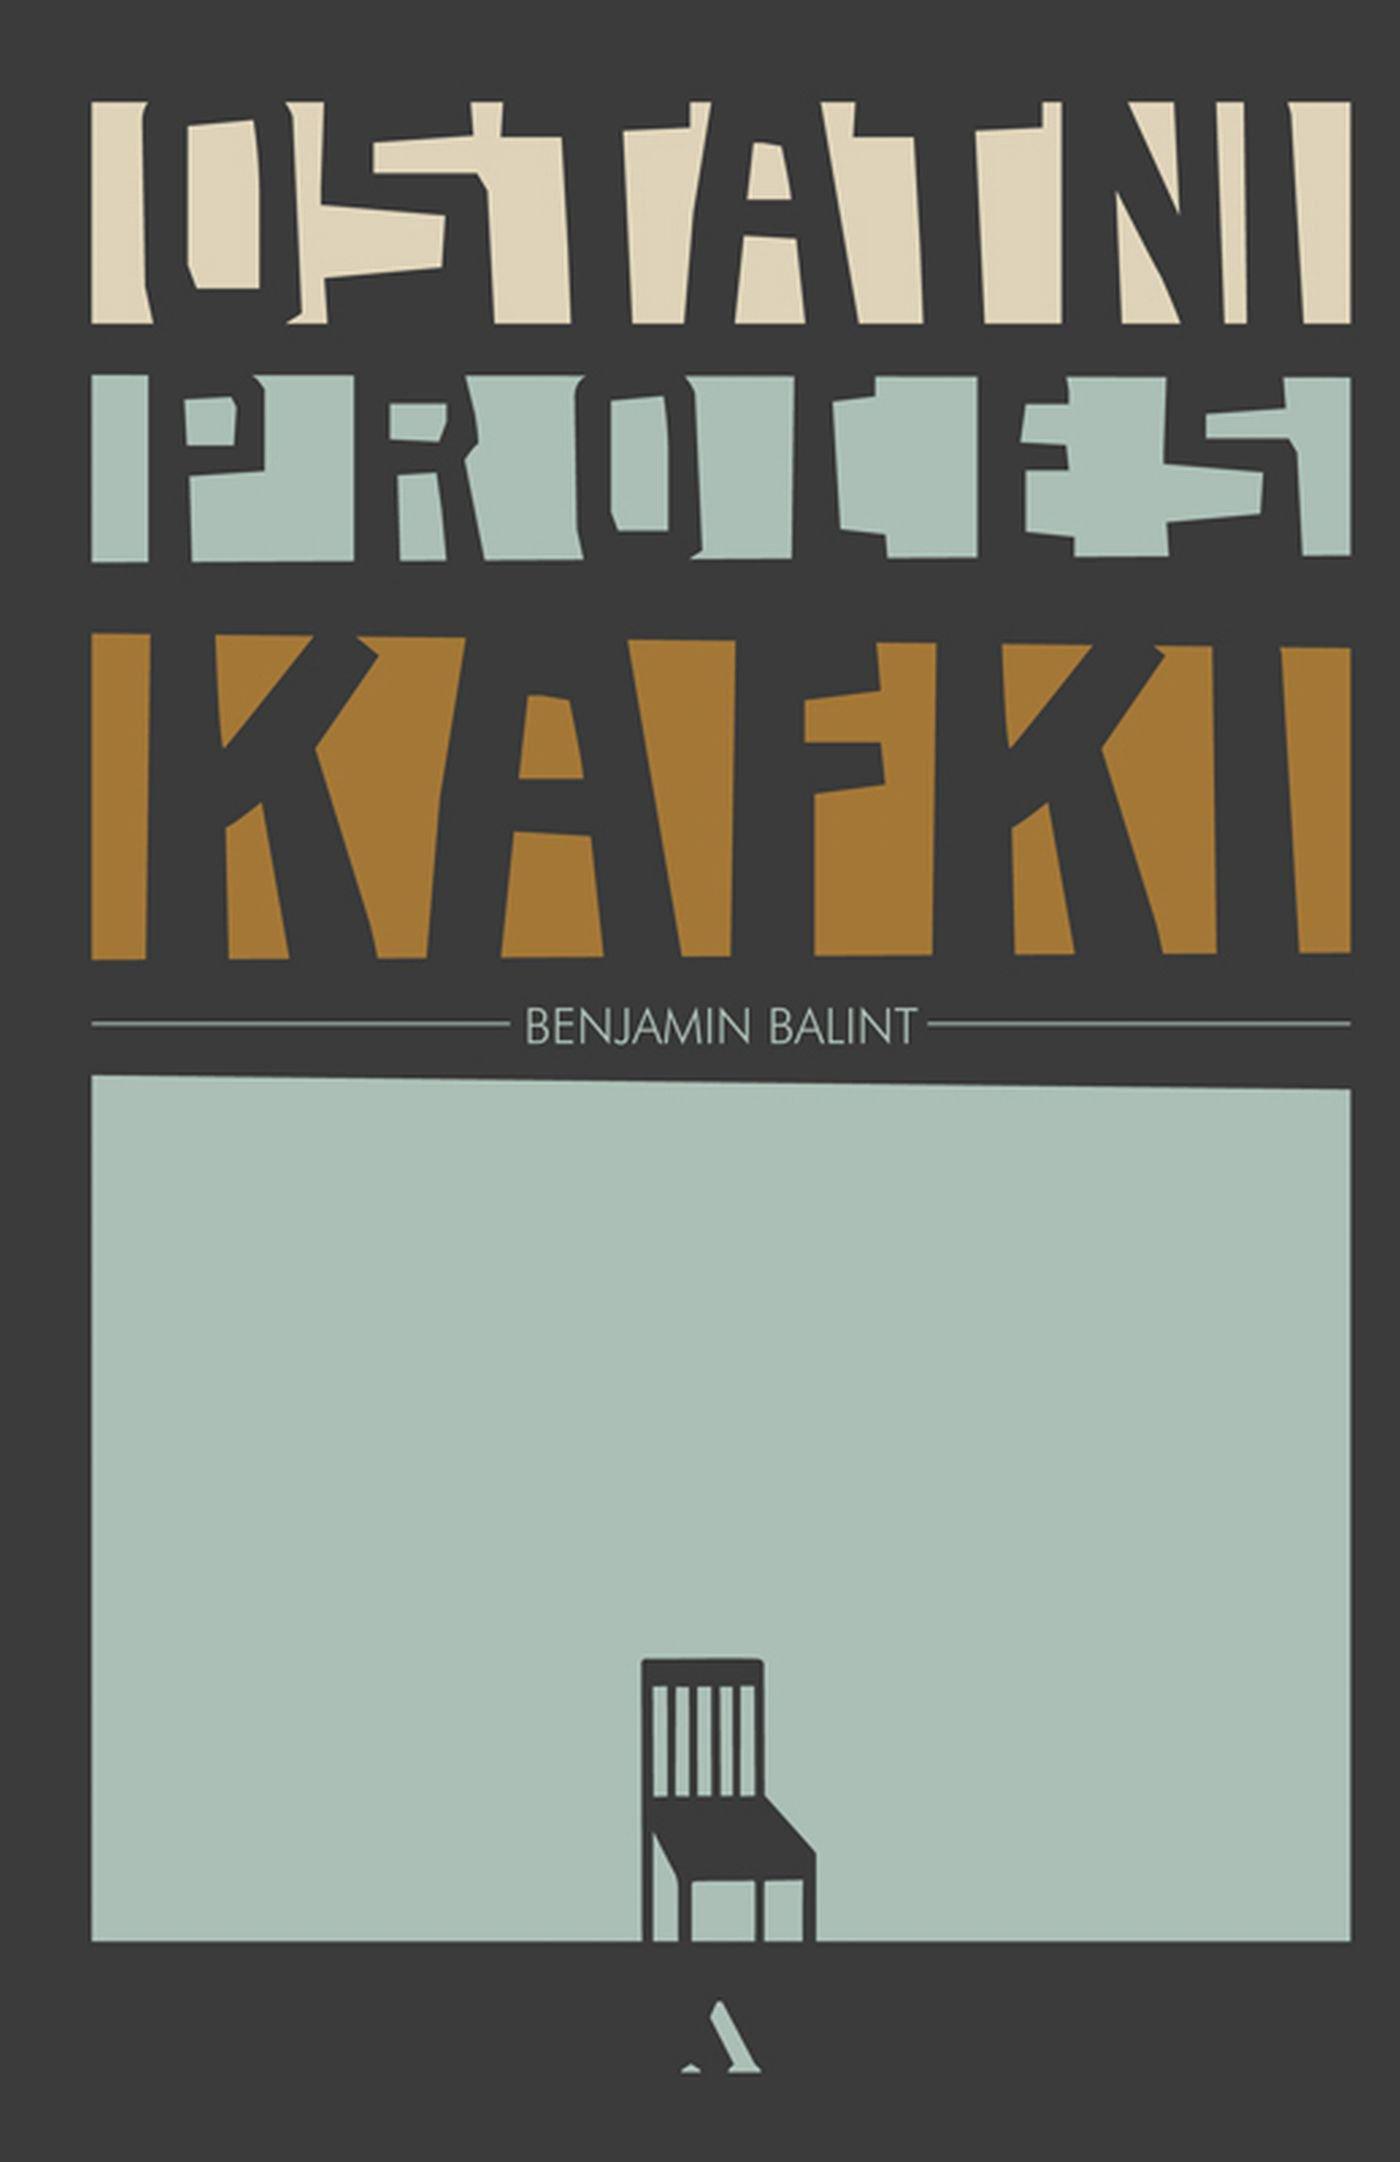 Ostatni proces Kafki - Ebook (Książka na Kindle) do pobrania w formacie MOBI